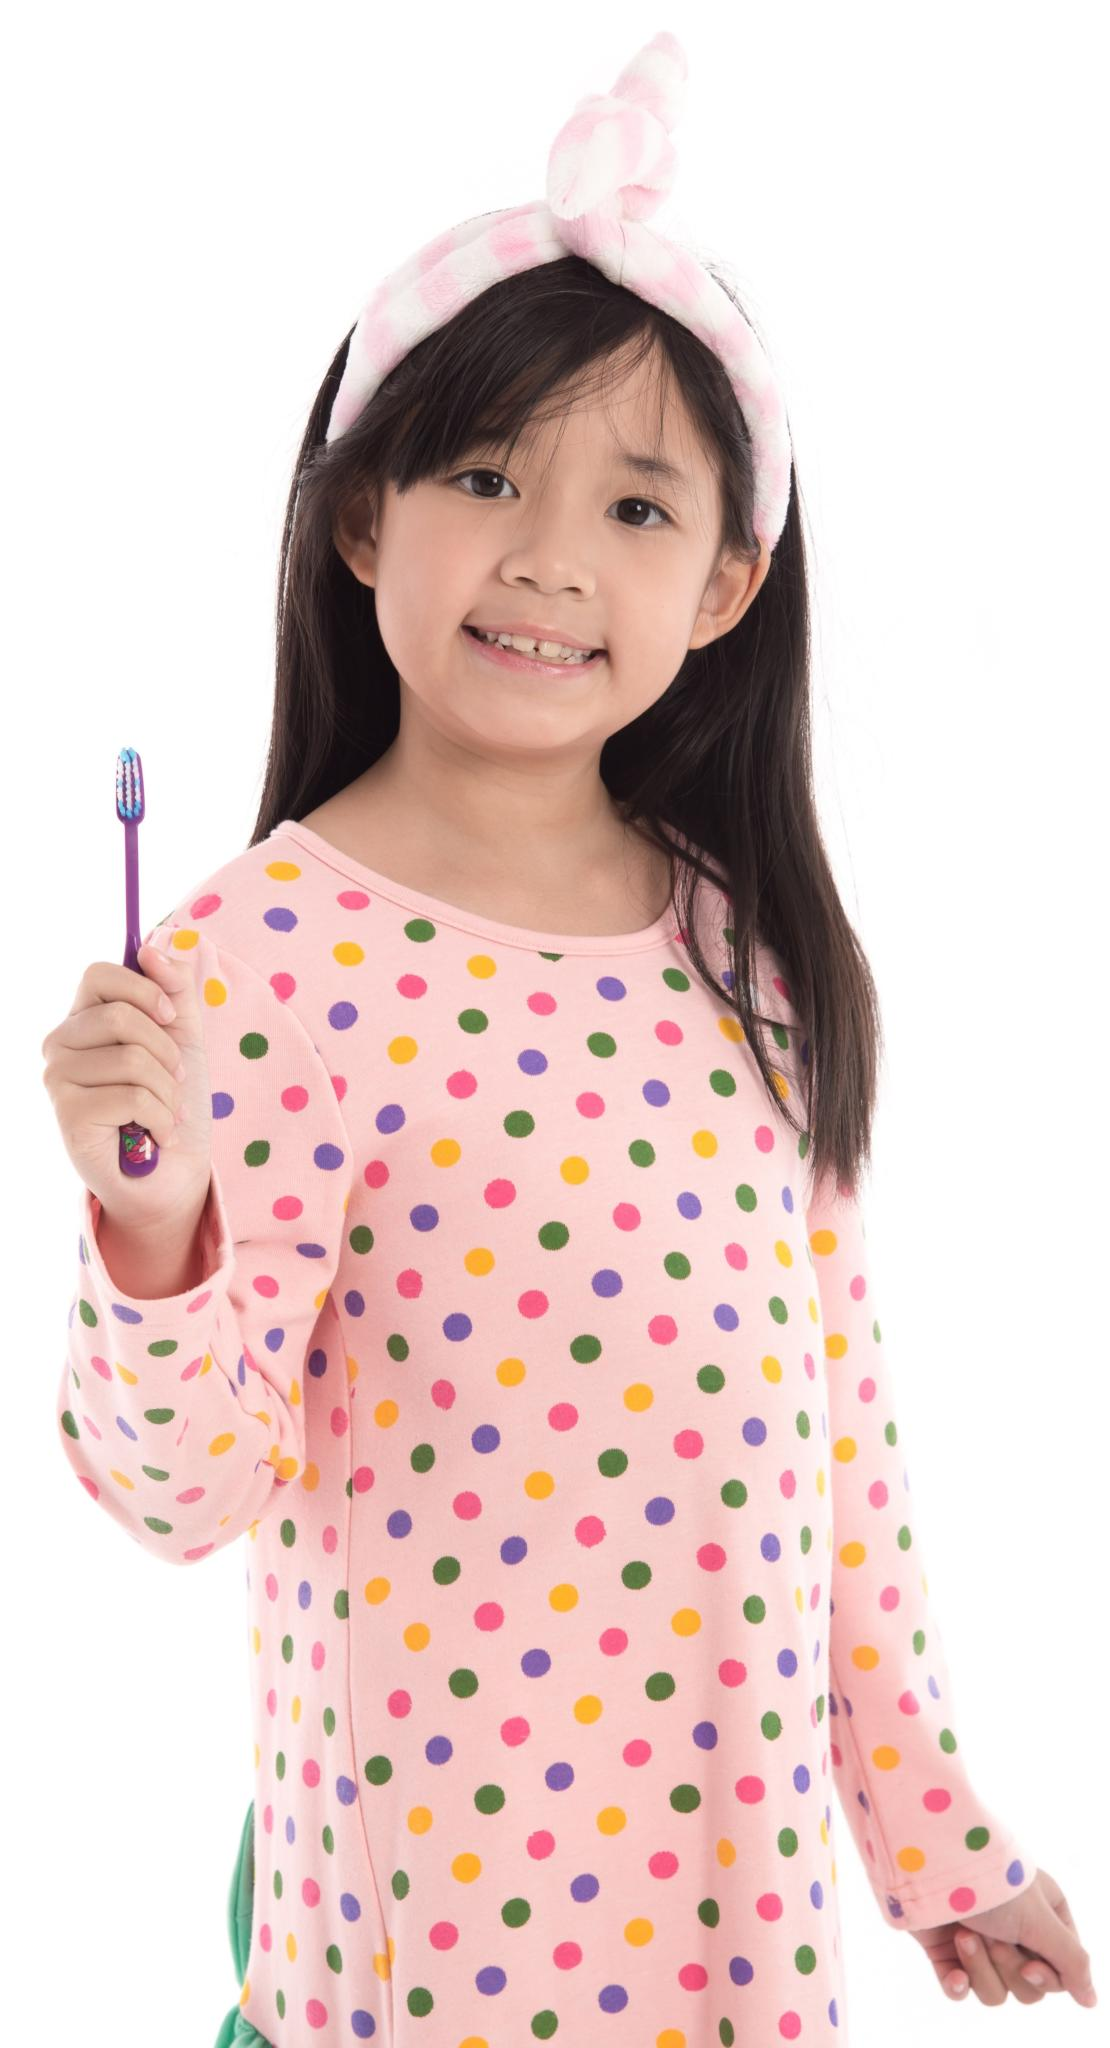 dentalcarechild